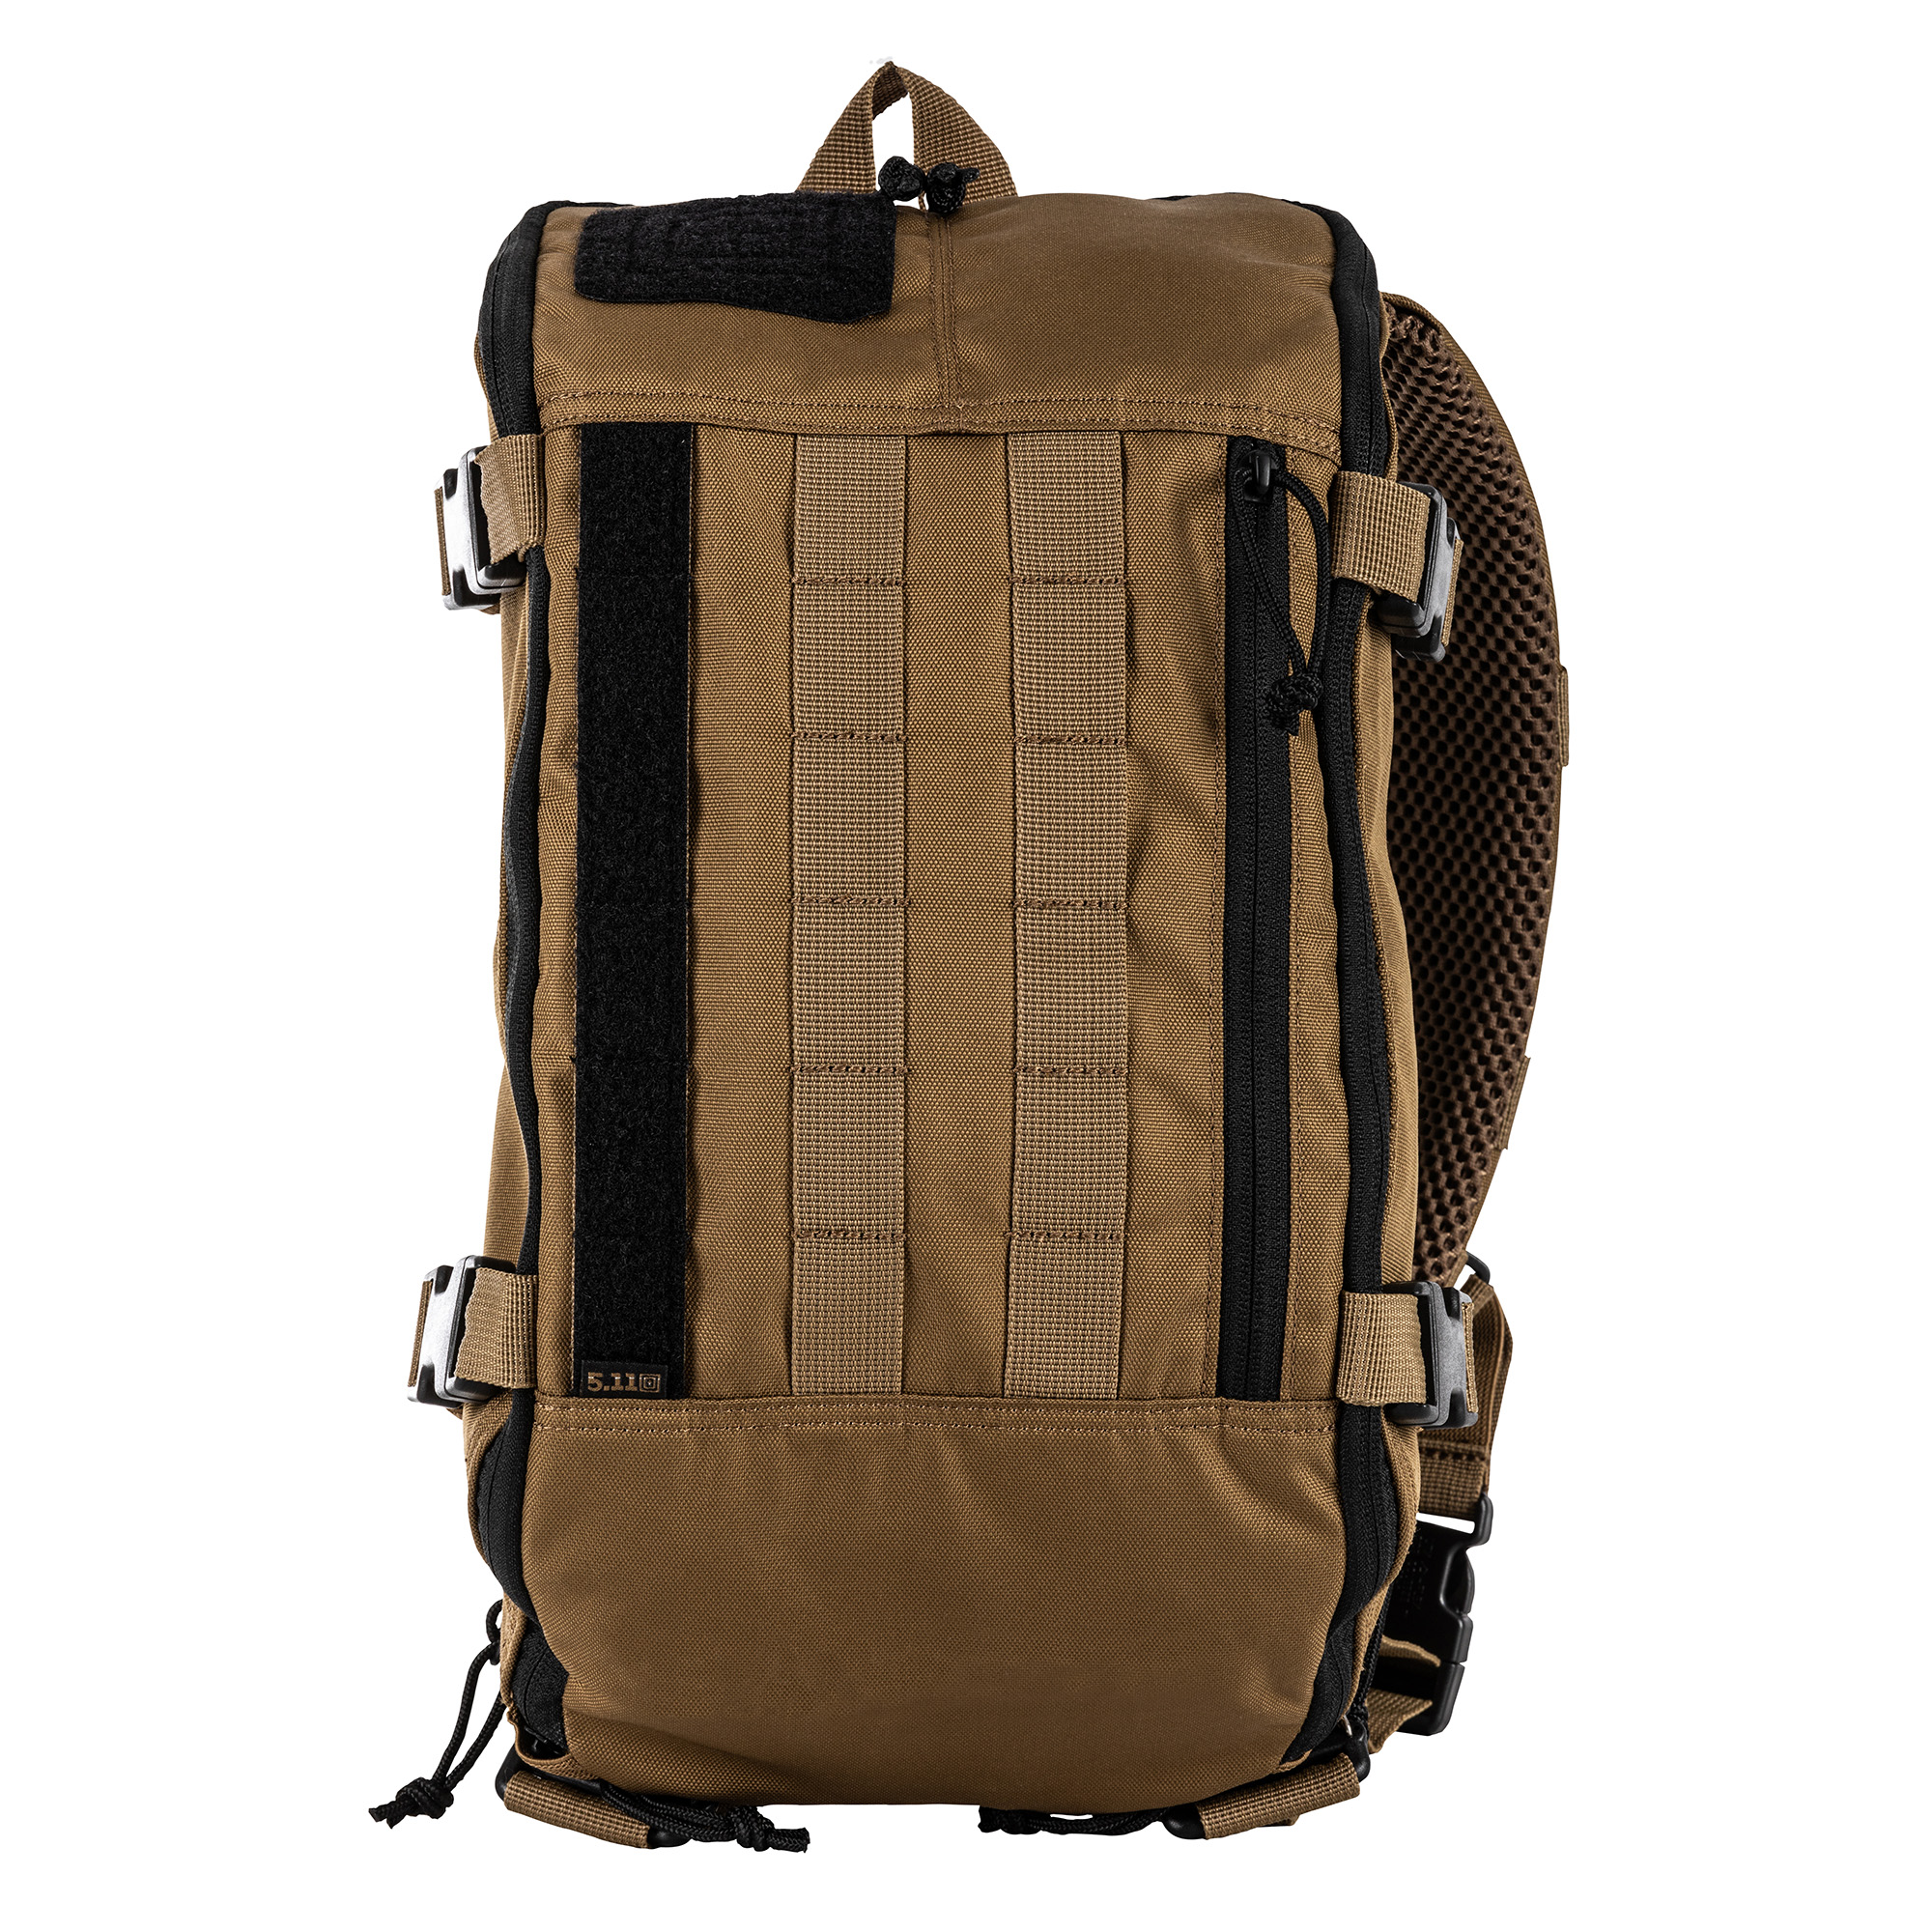 Balo 1 Quai 5.11 Tactical RAPID SLING PACK 10L